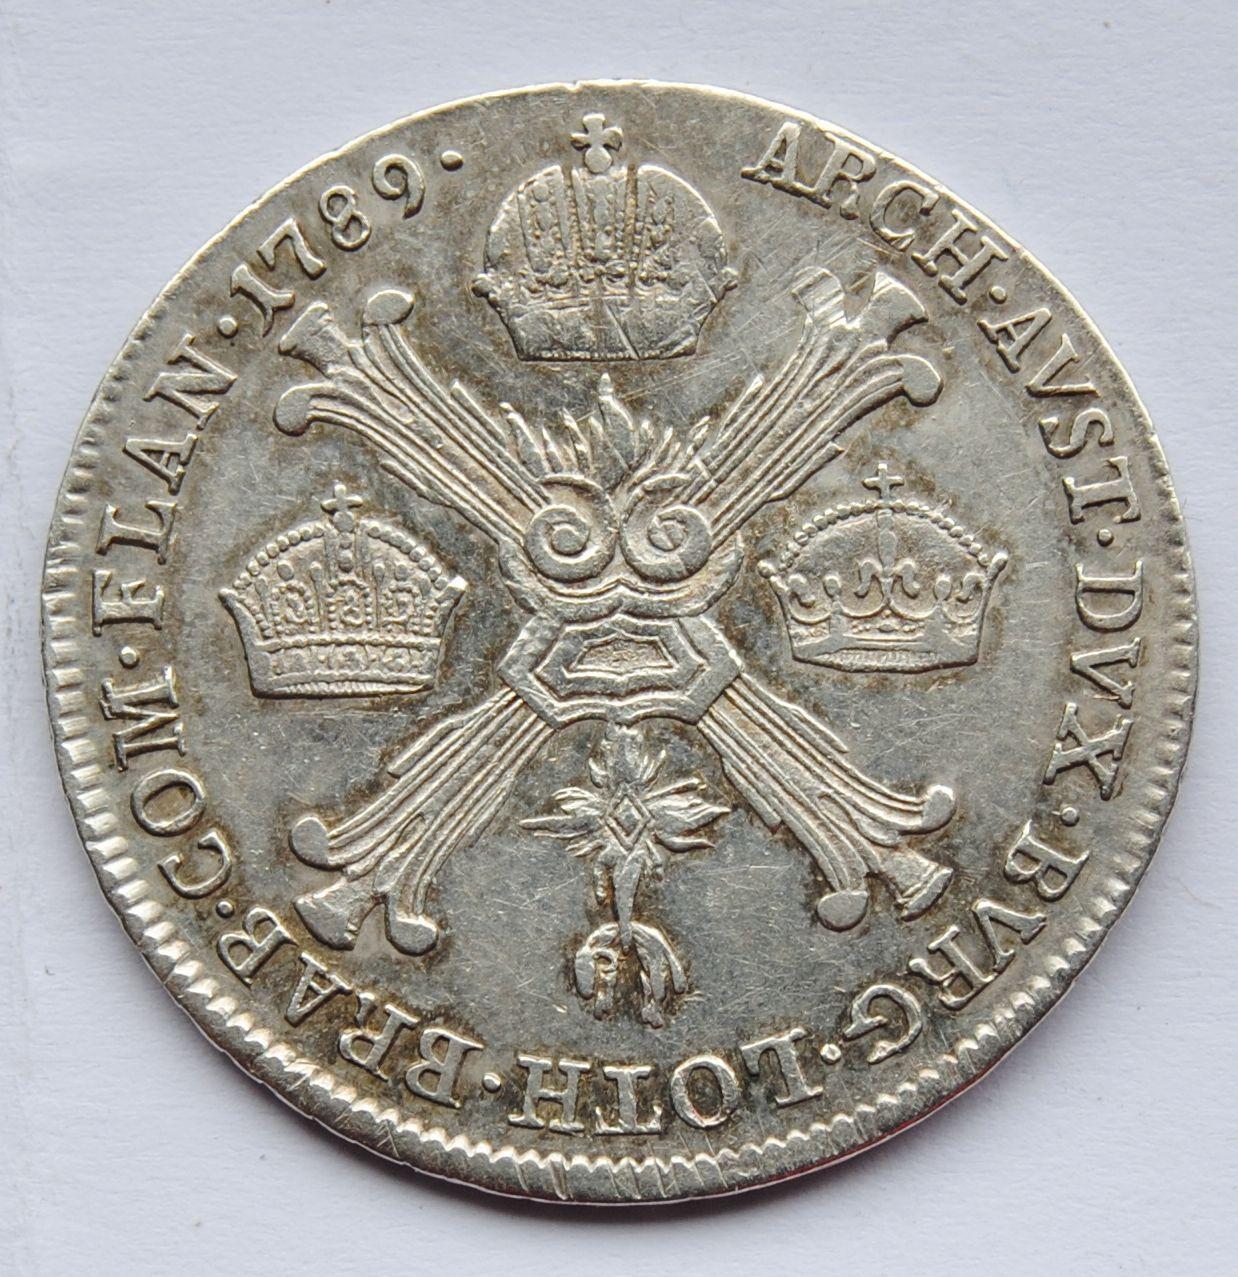 Uhry 1/4 Tolar B 1789 Josef II.